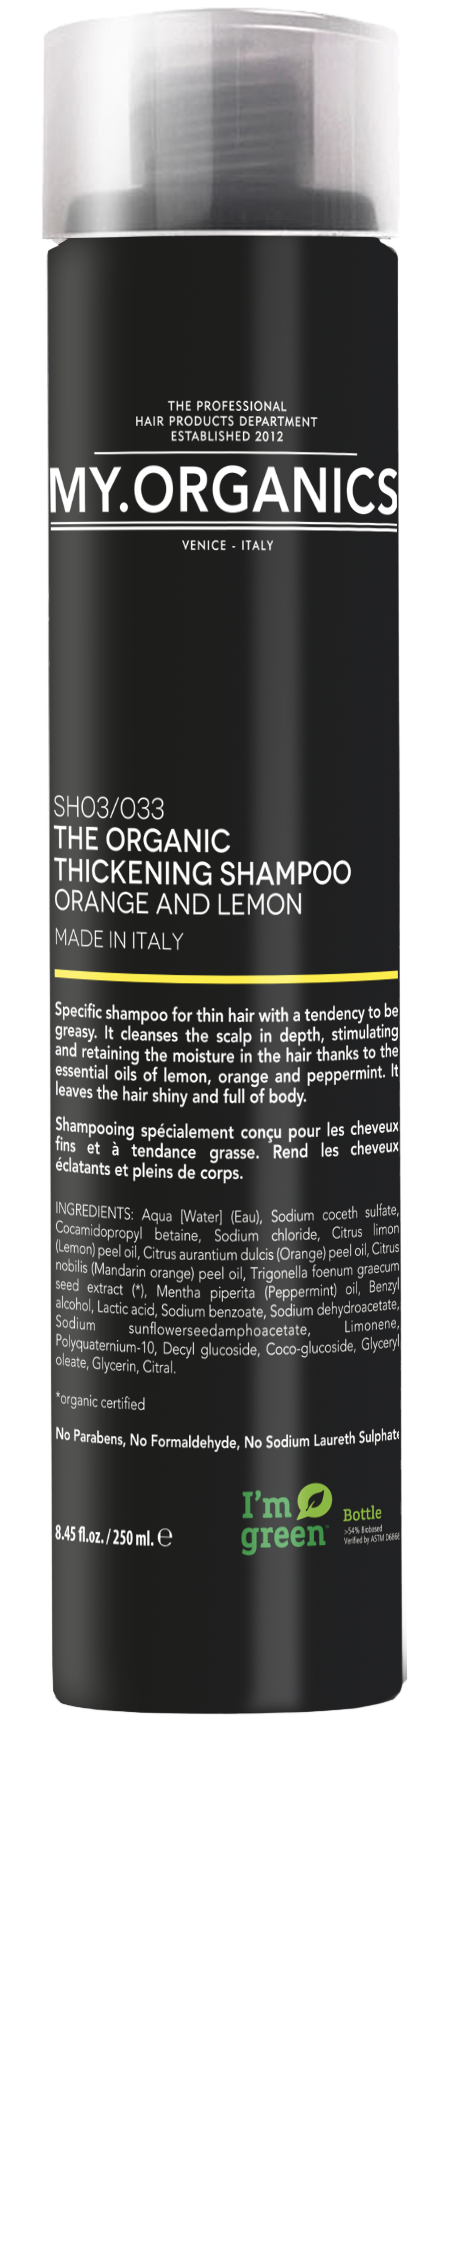 Thickening Shampoo MY.ORGANICS